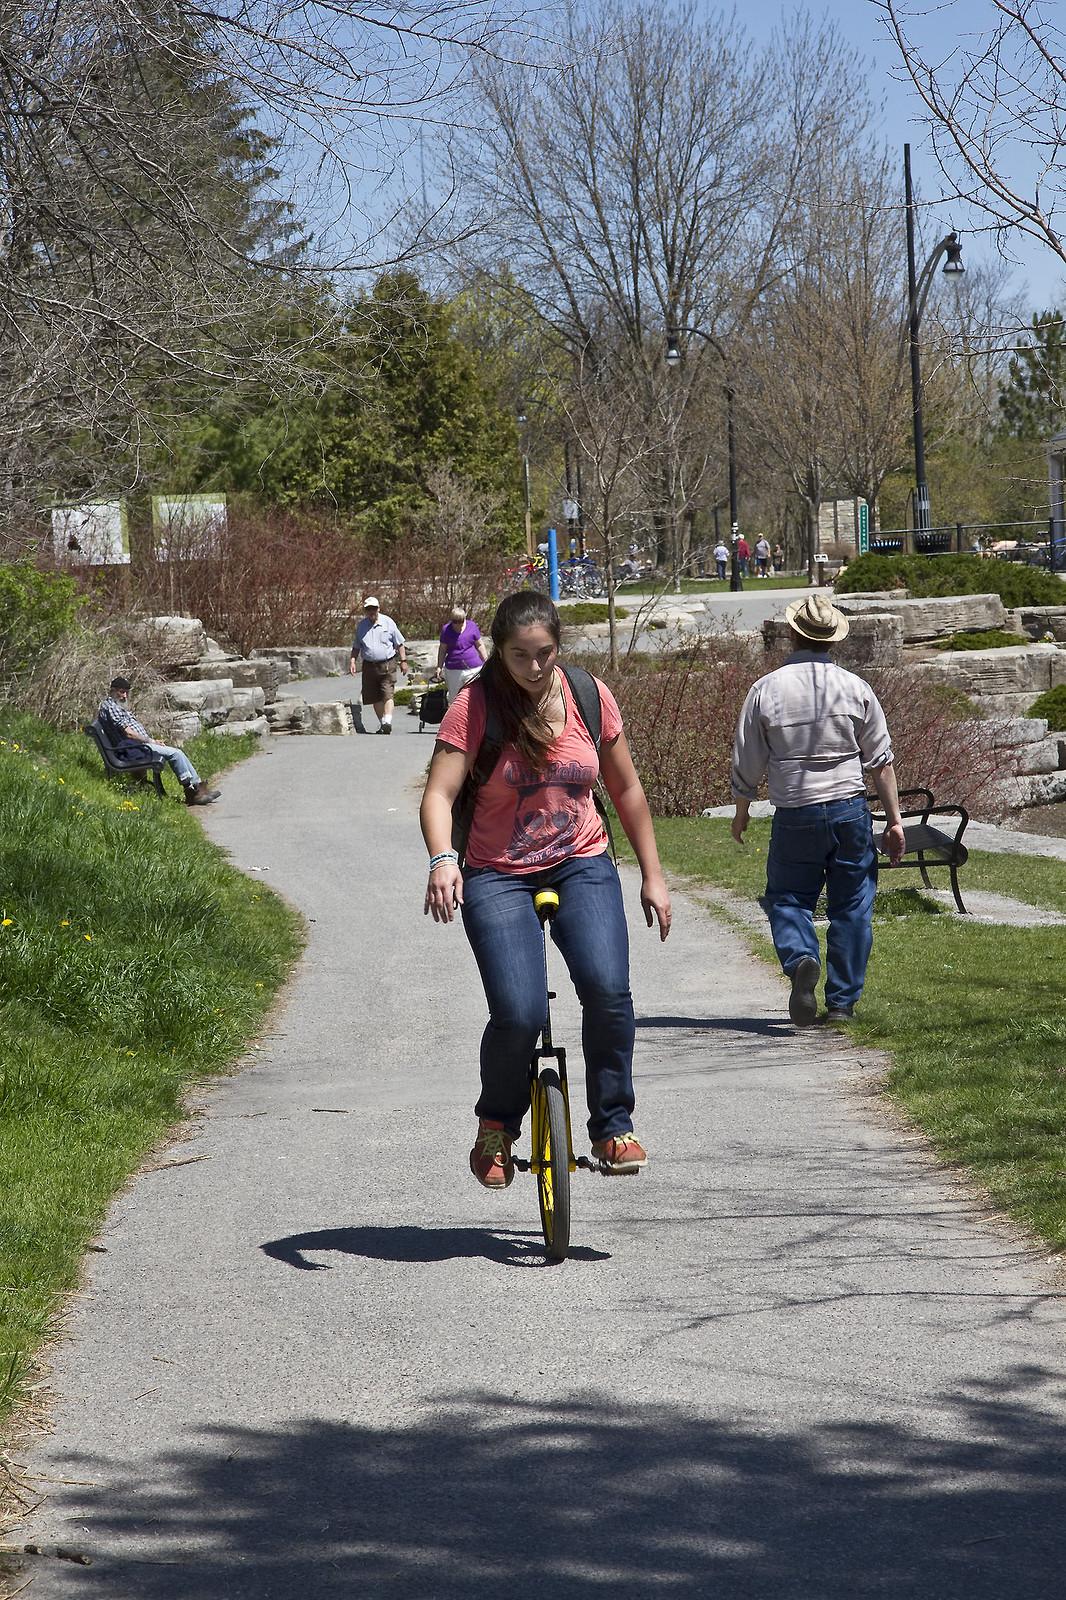 unicyclist8